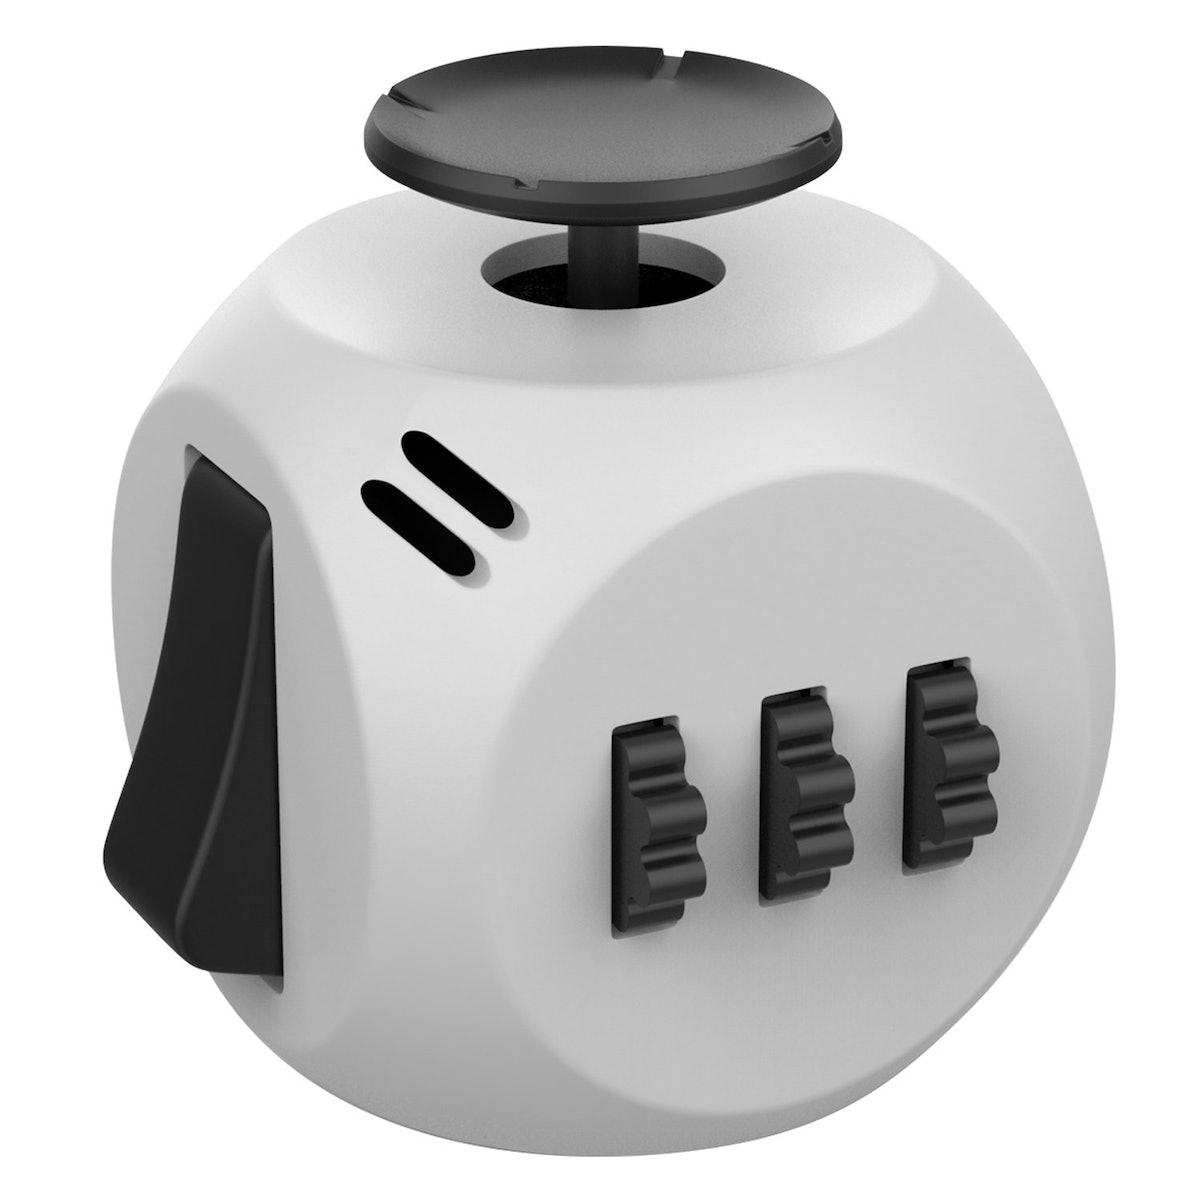 Helect Fidget Cube